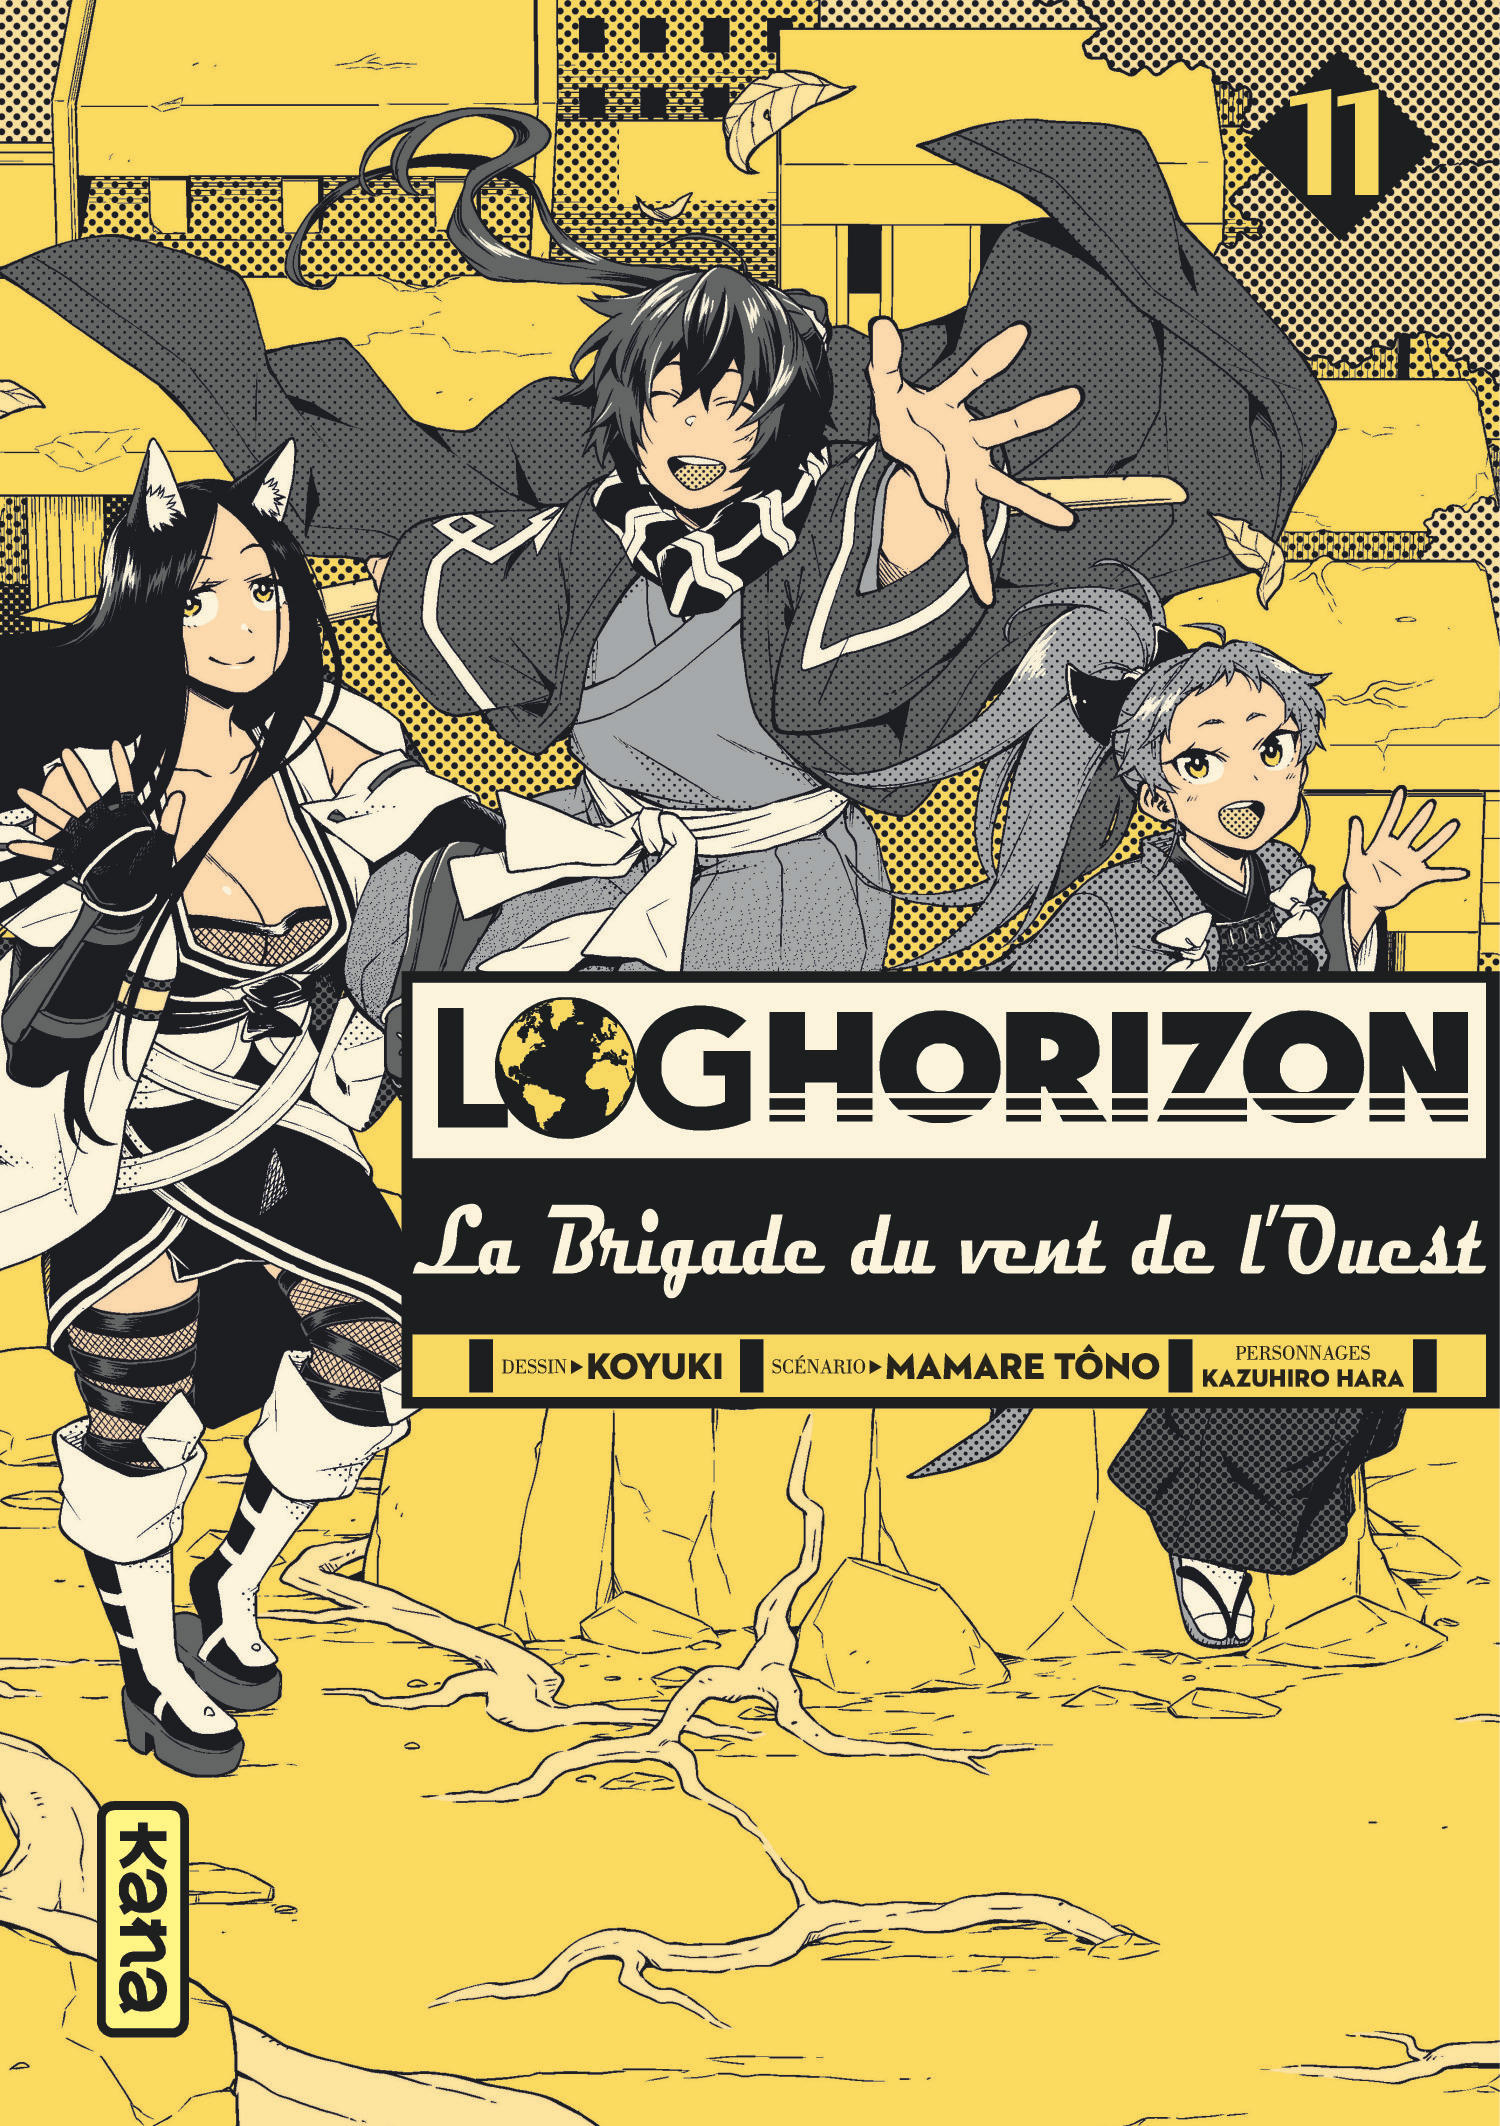 Log Horizon - La brigade du vent de l'Ouest 11